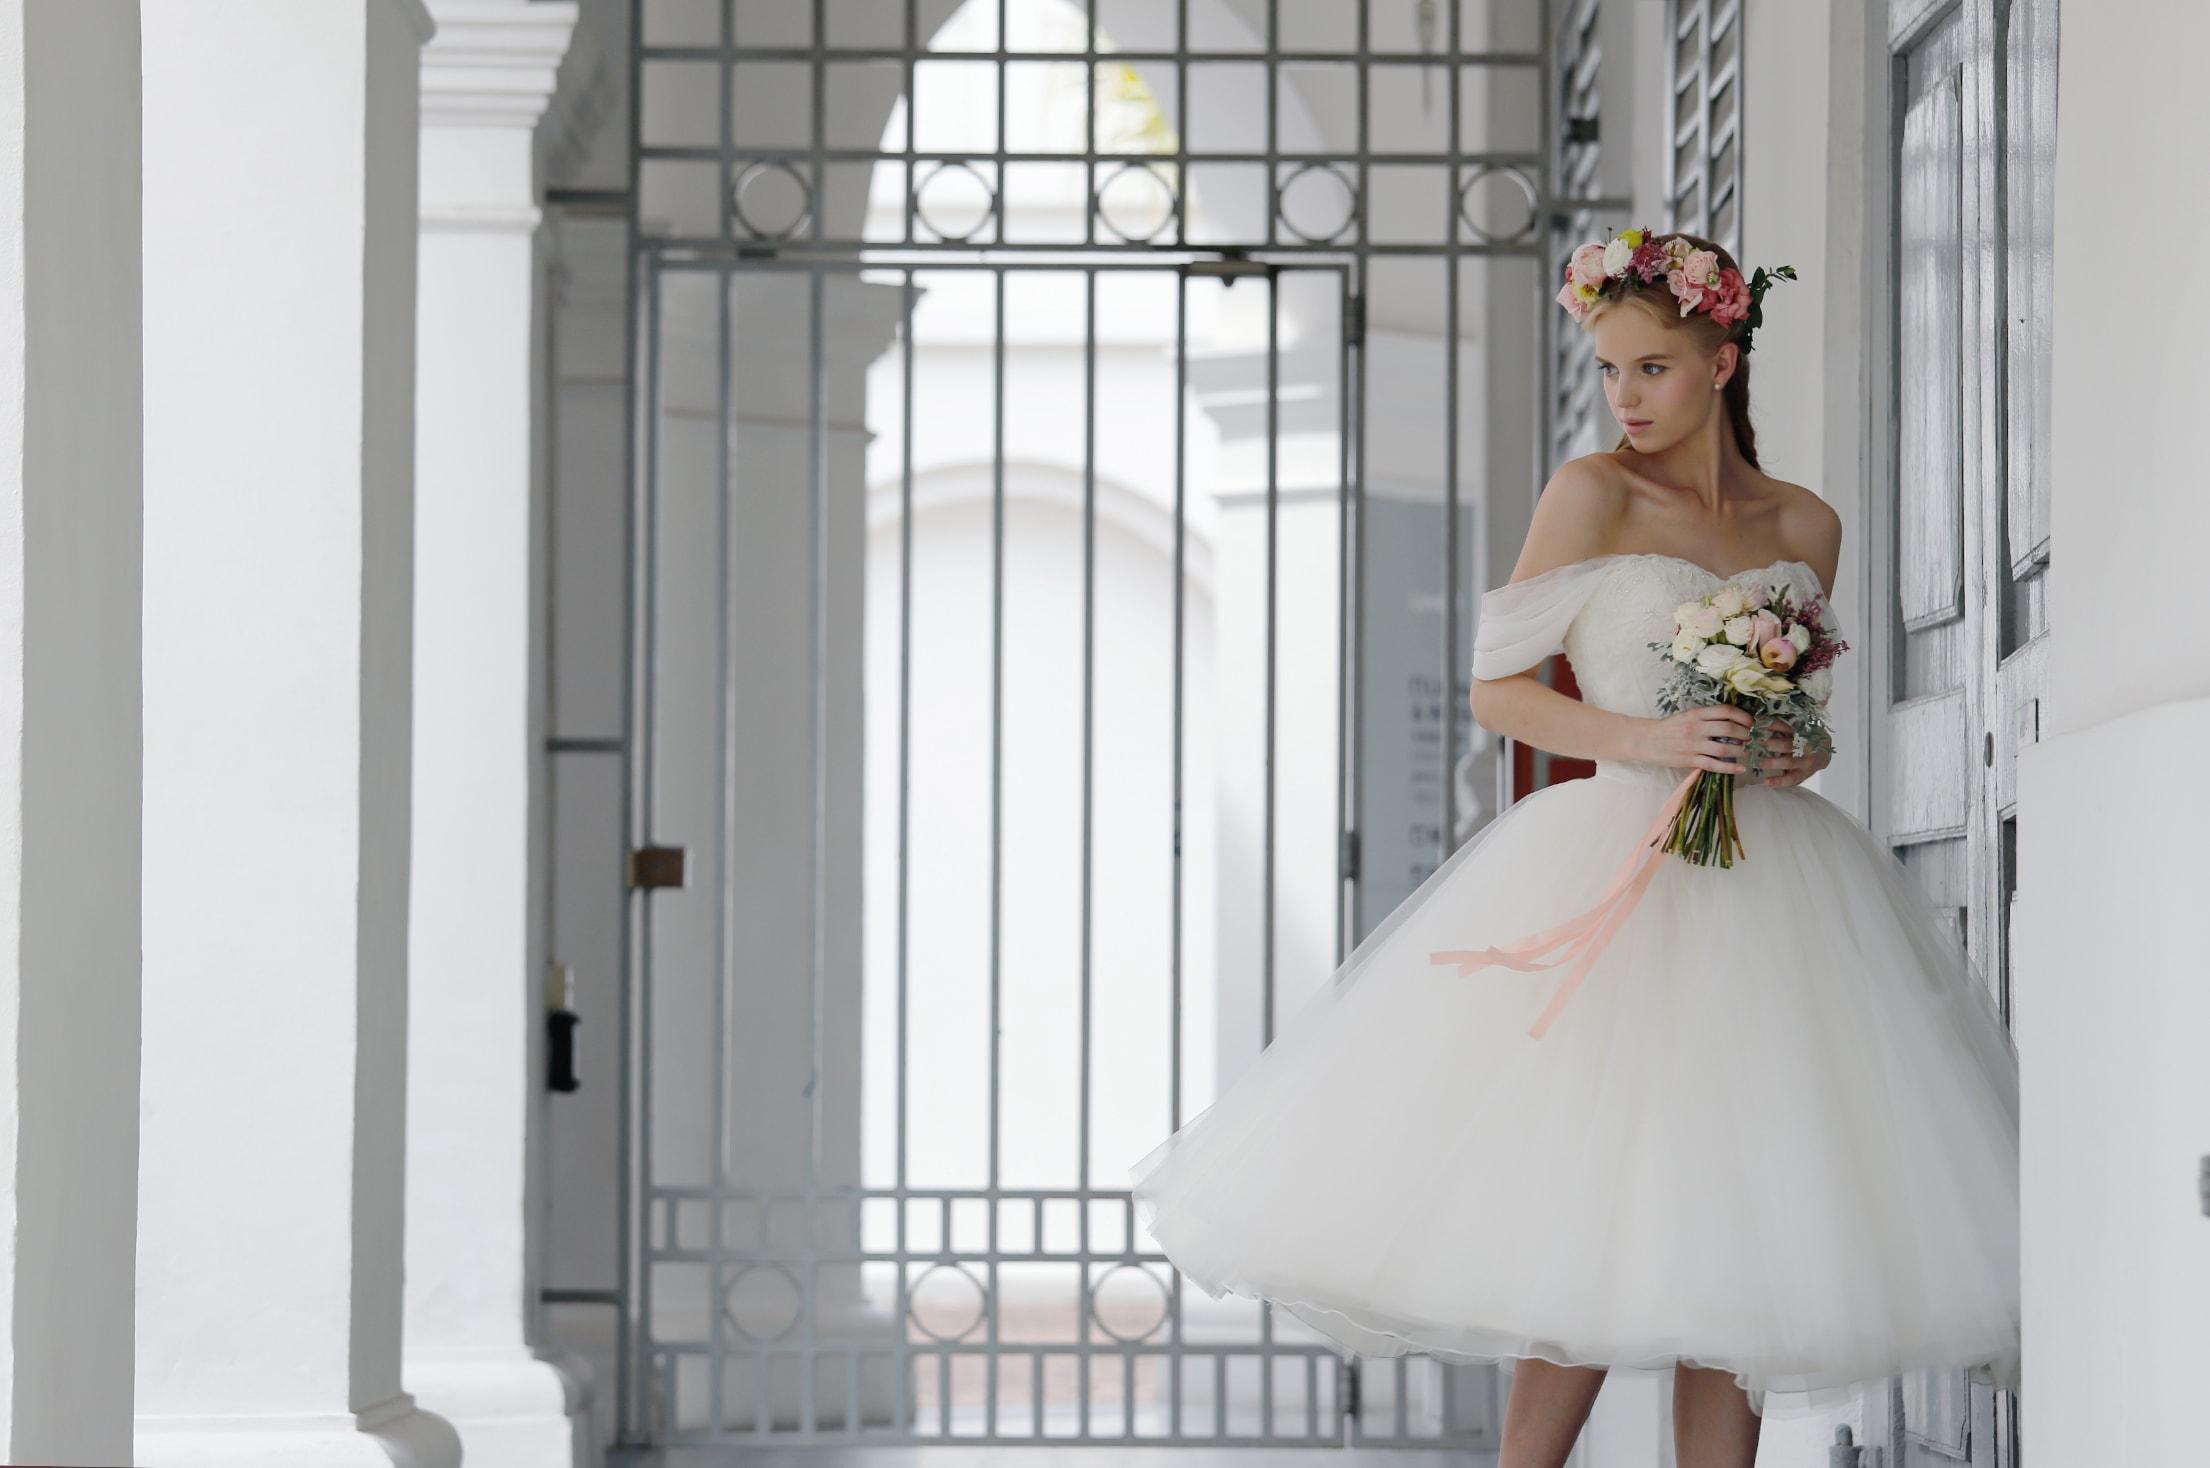 04-Z-Wedding-Off-shoulder-Engagement-Lace-Bodice-Tulle-Midi-Dress